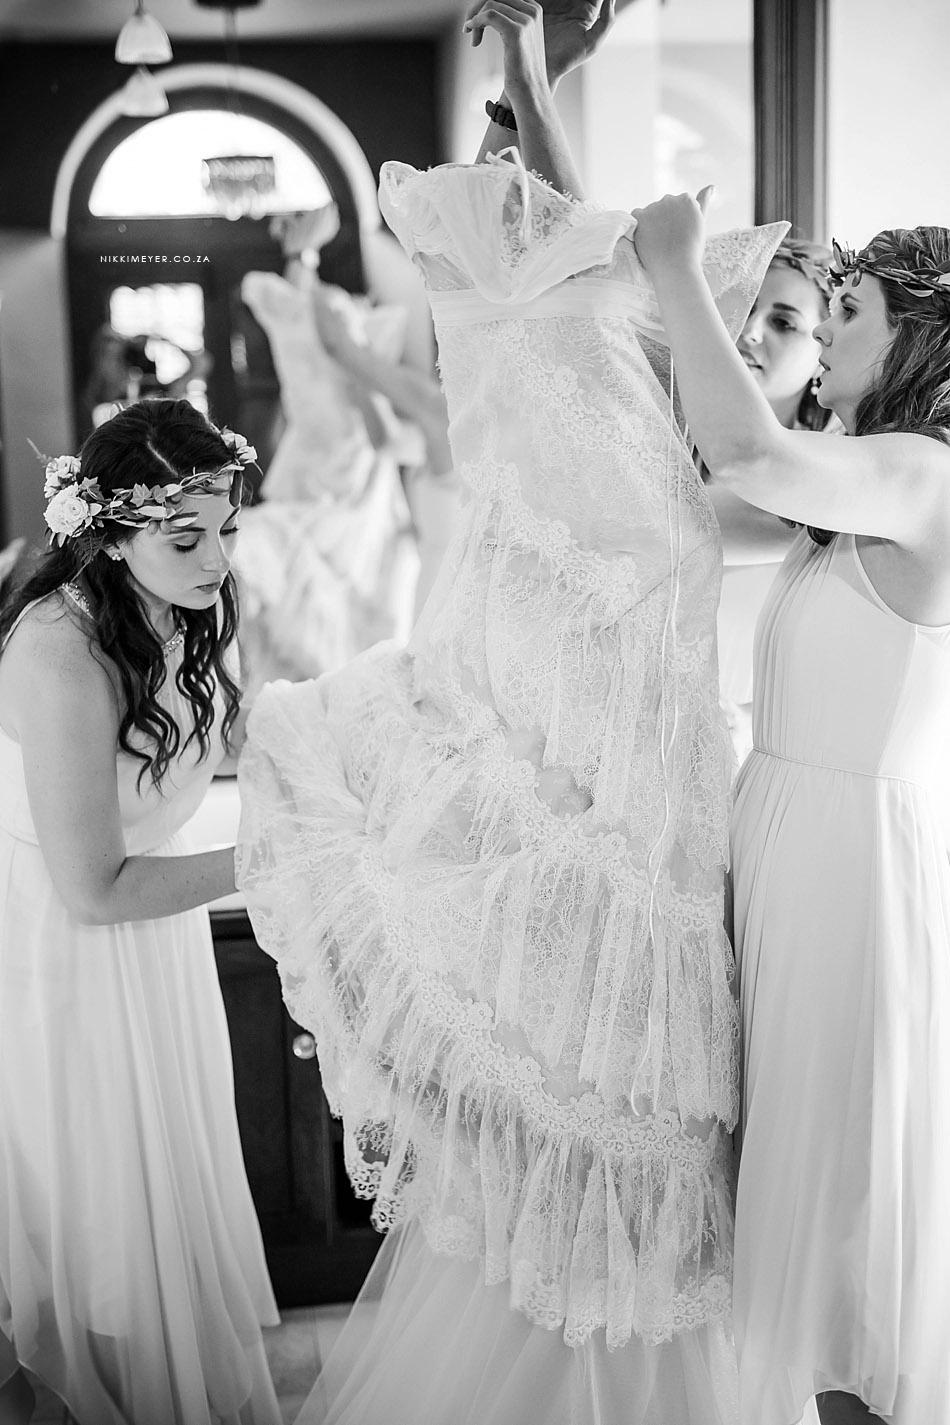 nikki_meyer_nooitgedacht_wedding_stellenbosch_009